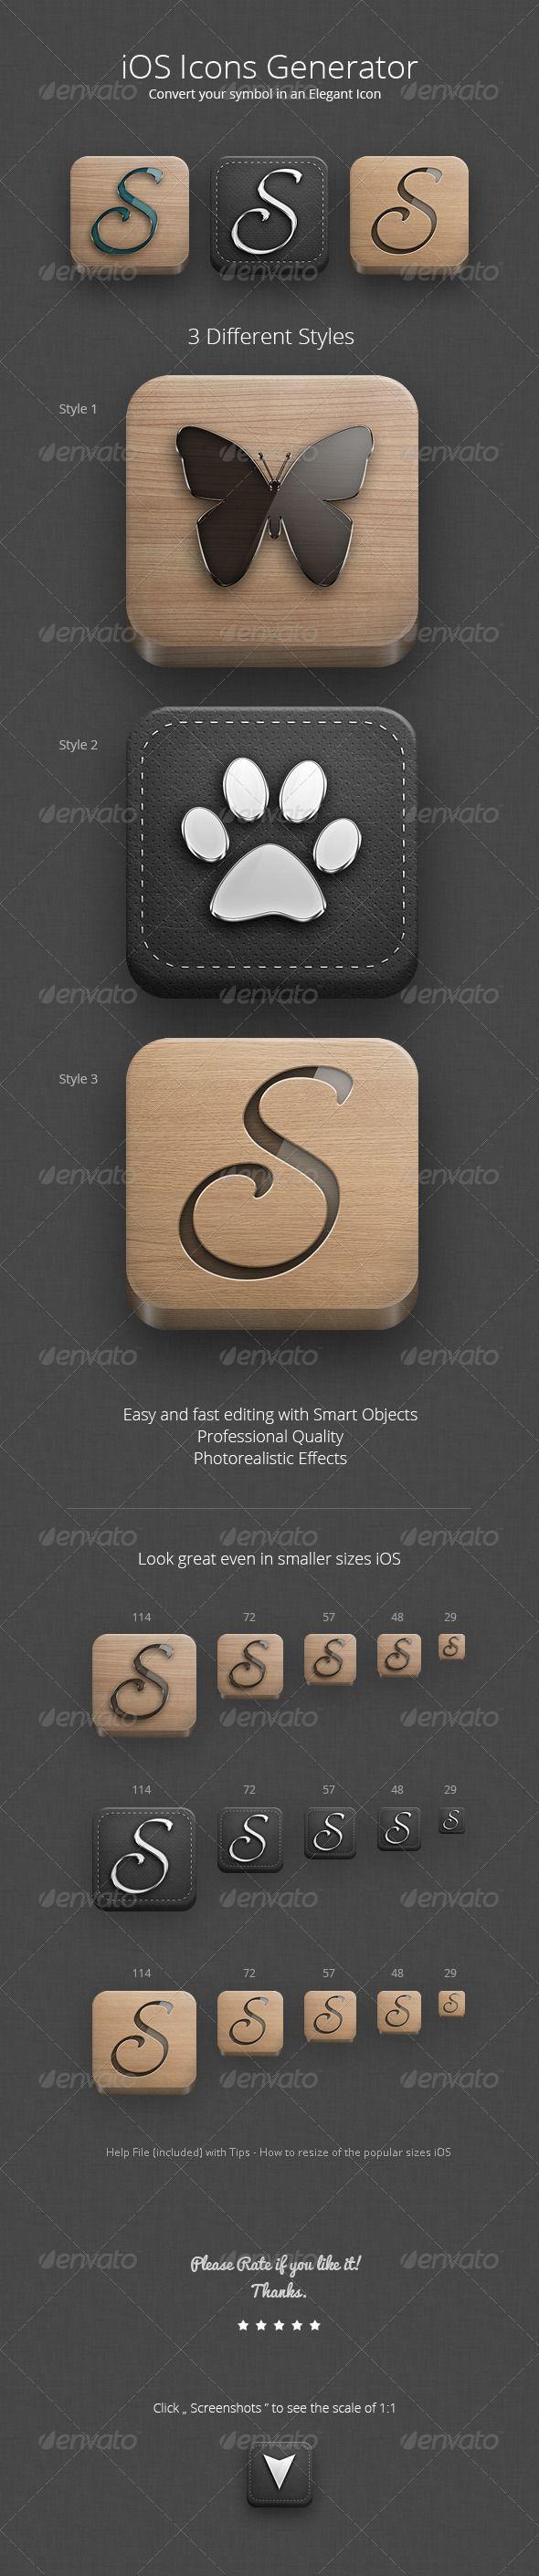 iOS Icons Generator